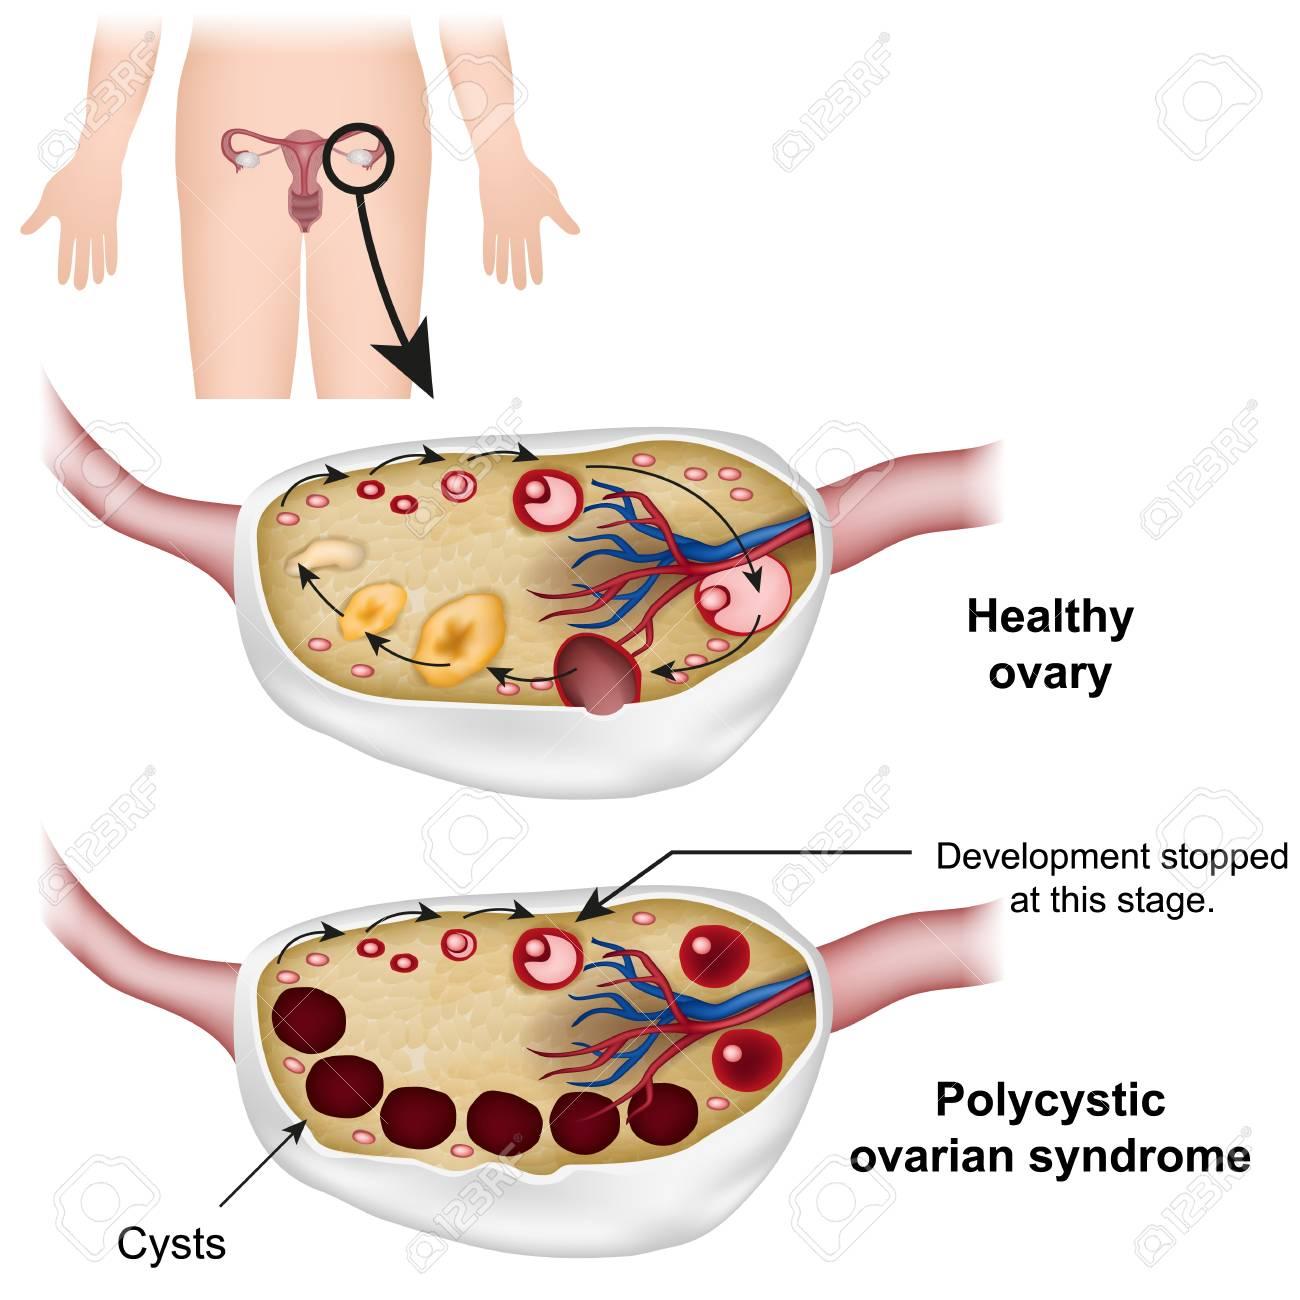 Polycystic ovarian syndrome medical vector illustration - 117795147